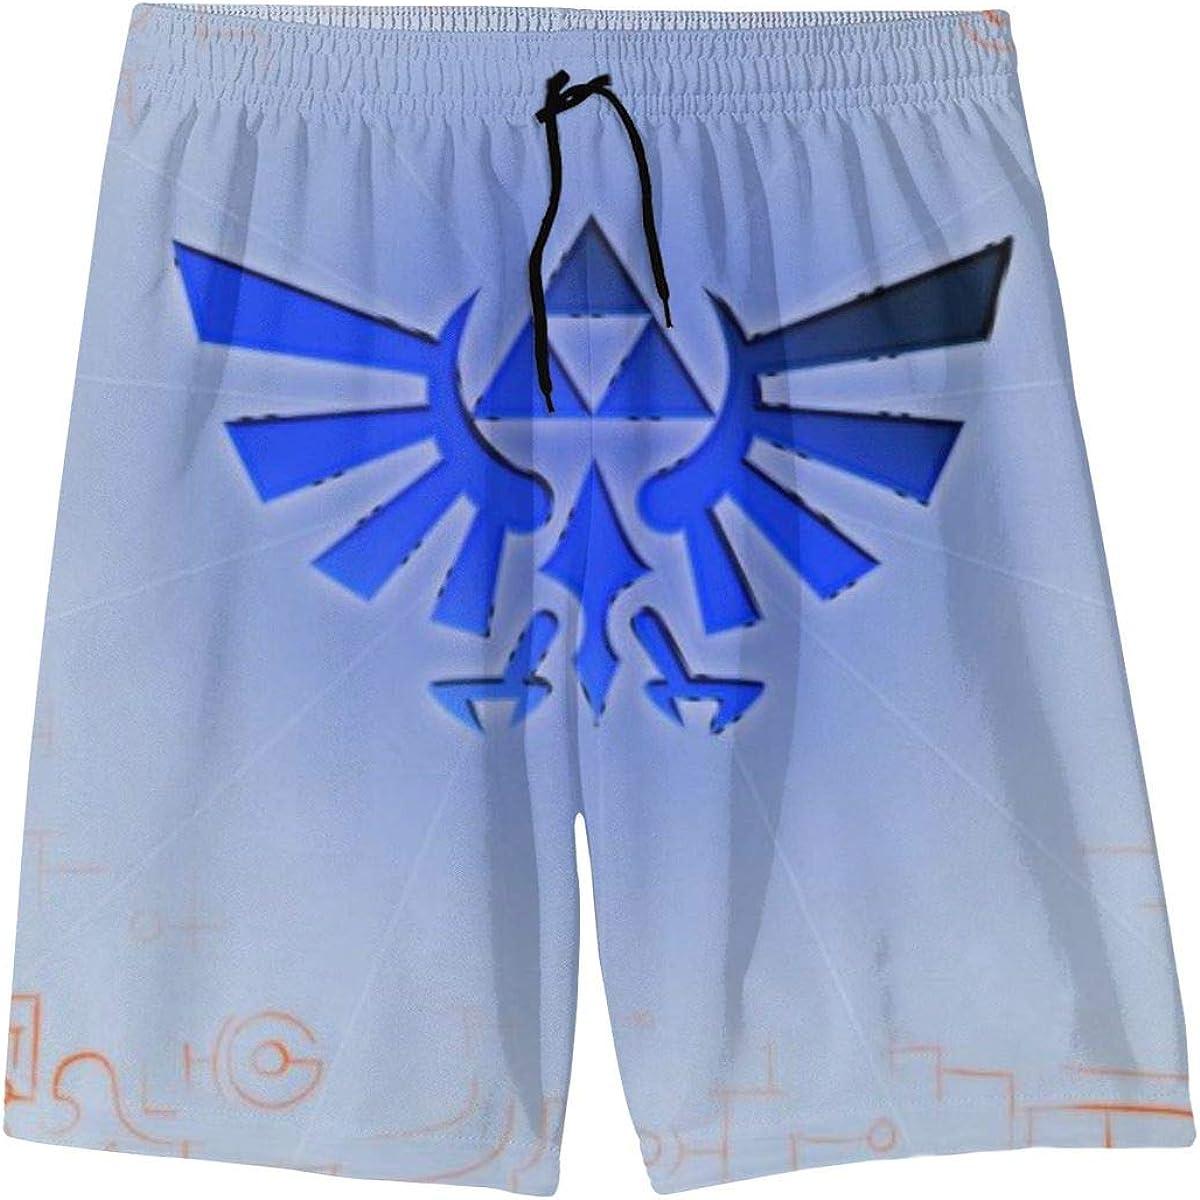 LIFUQING The Legend of Zelda Teenager Shorts Boy and Girl Swimming Shorts Mesh Lined Beach Pants